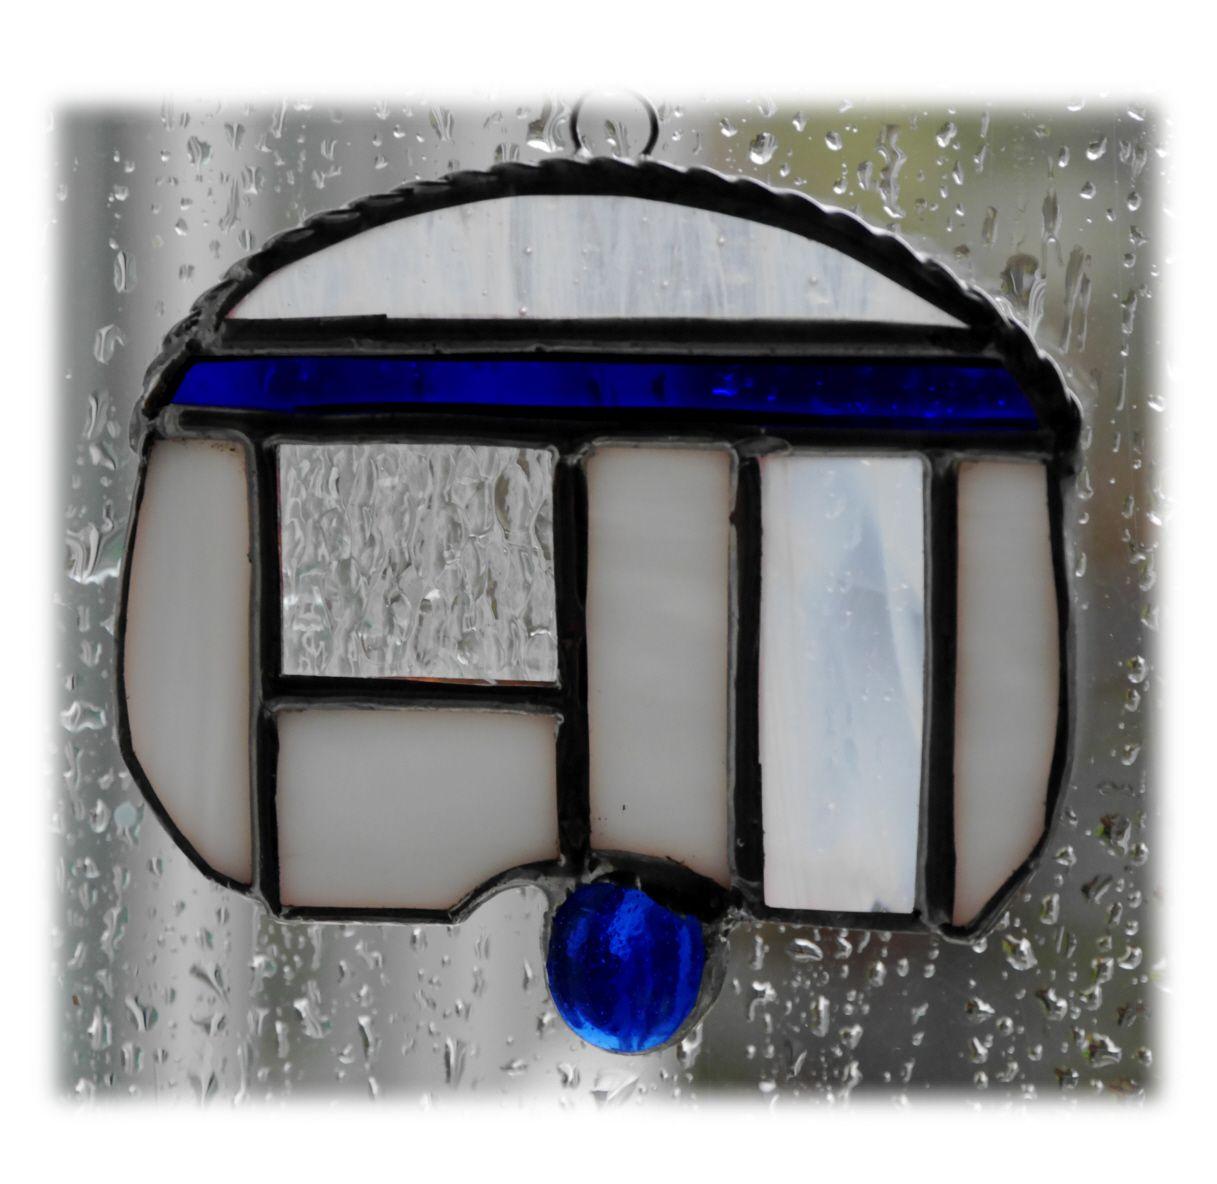 Caravan mini 030 Blue #1812 FREE 9.00